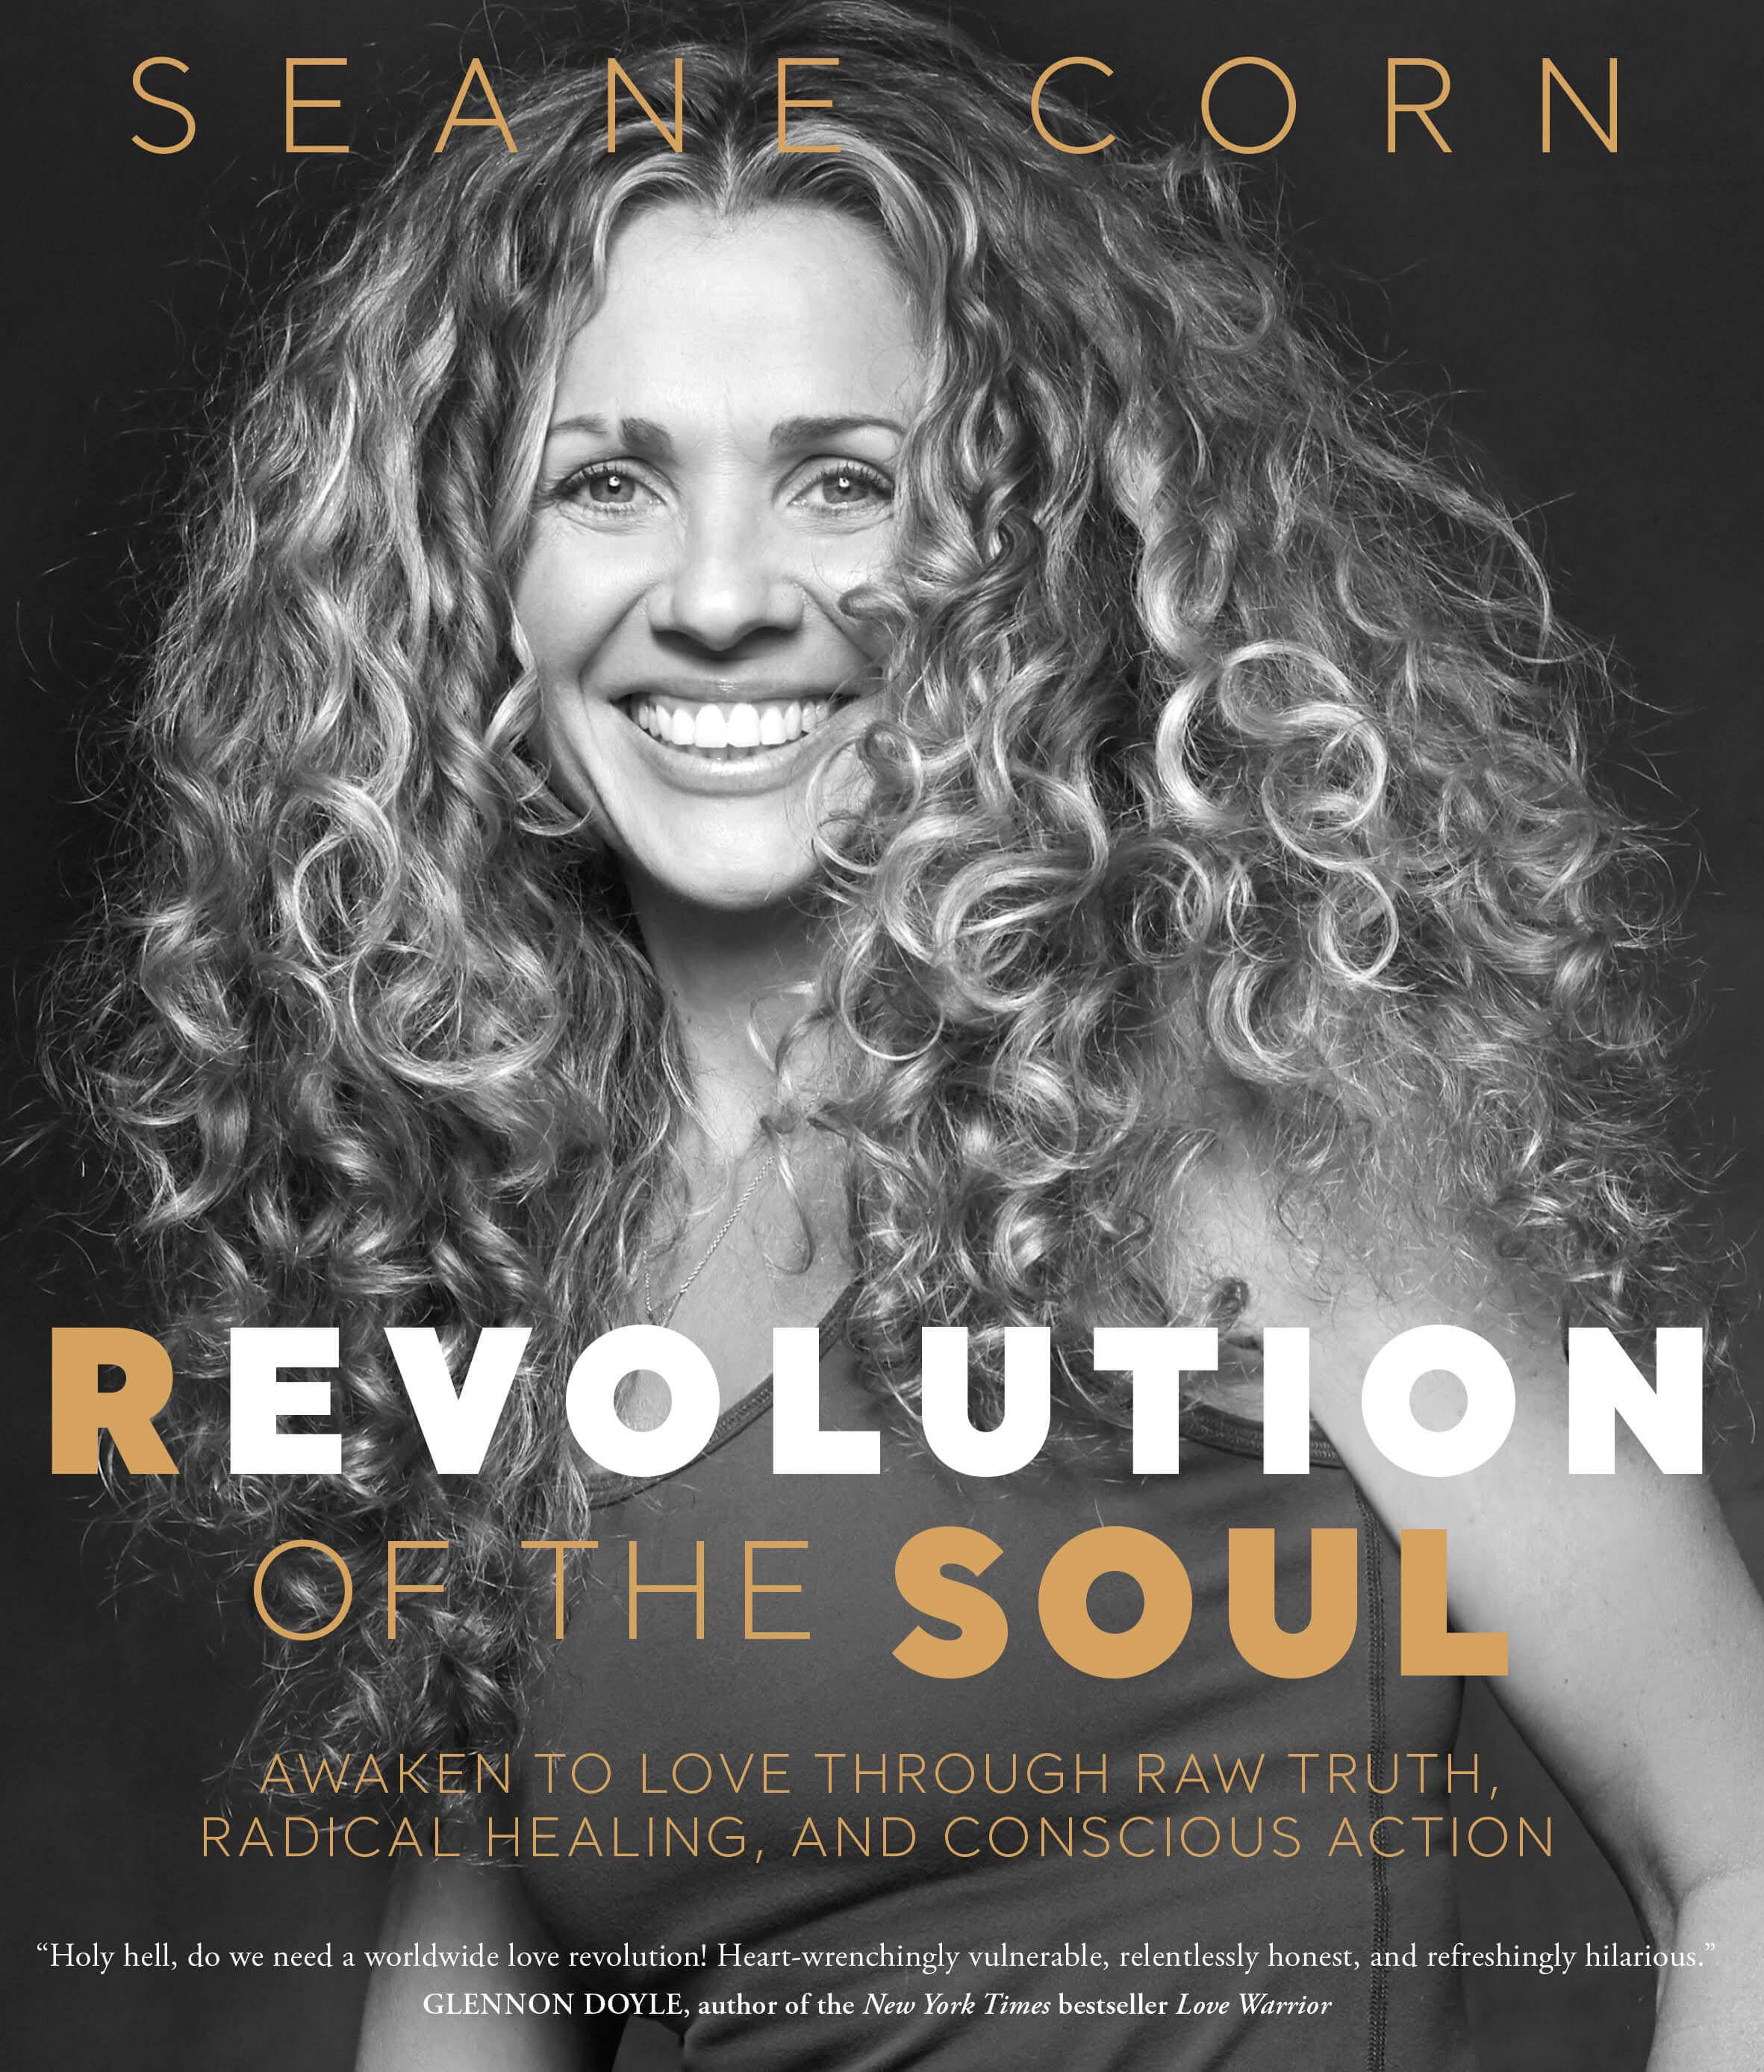 Revolution of the Soul